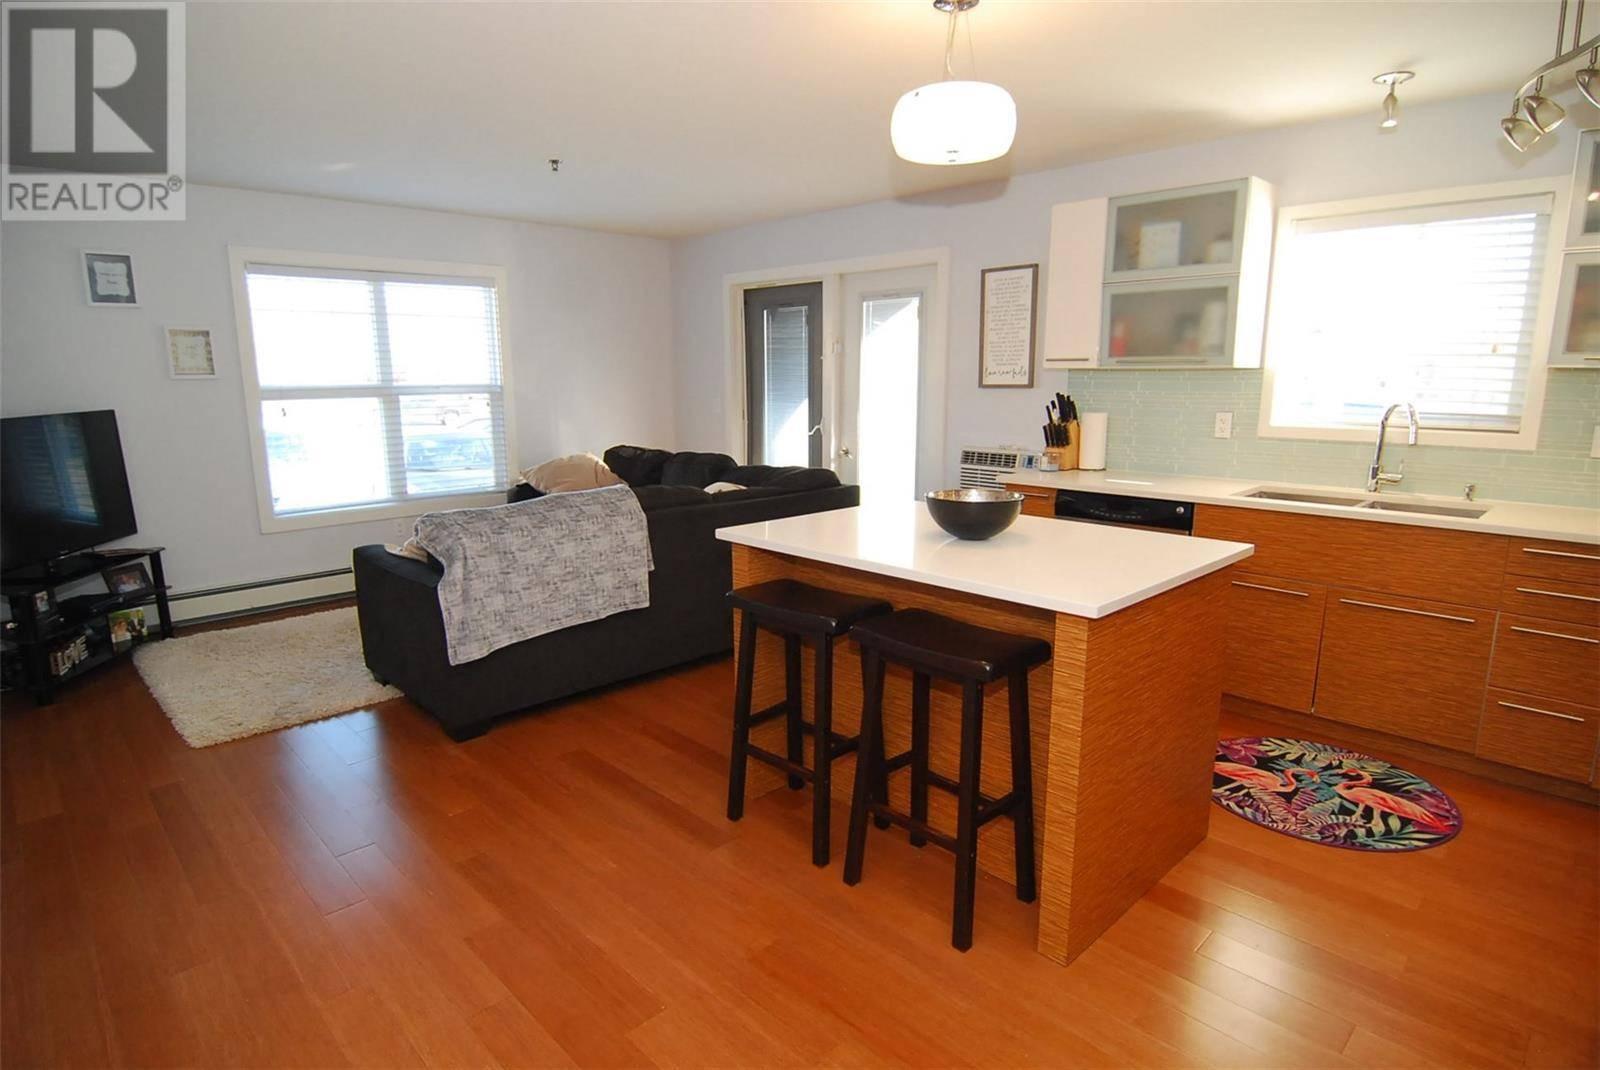 Condo for sale at 415 Hunter Rd Unit 101a Saskatoon Saskatchewan - MLS: SK790704